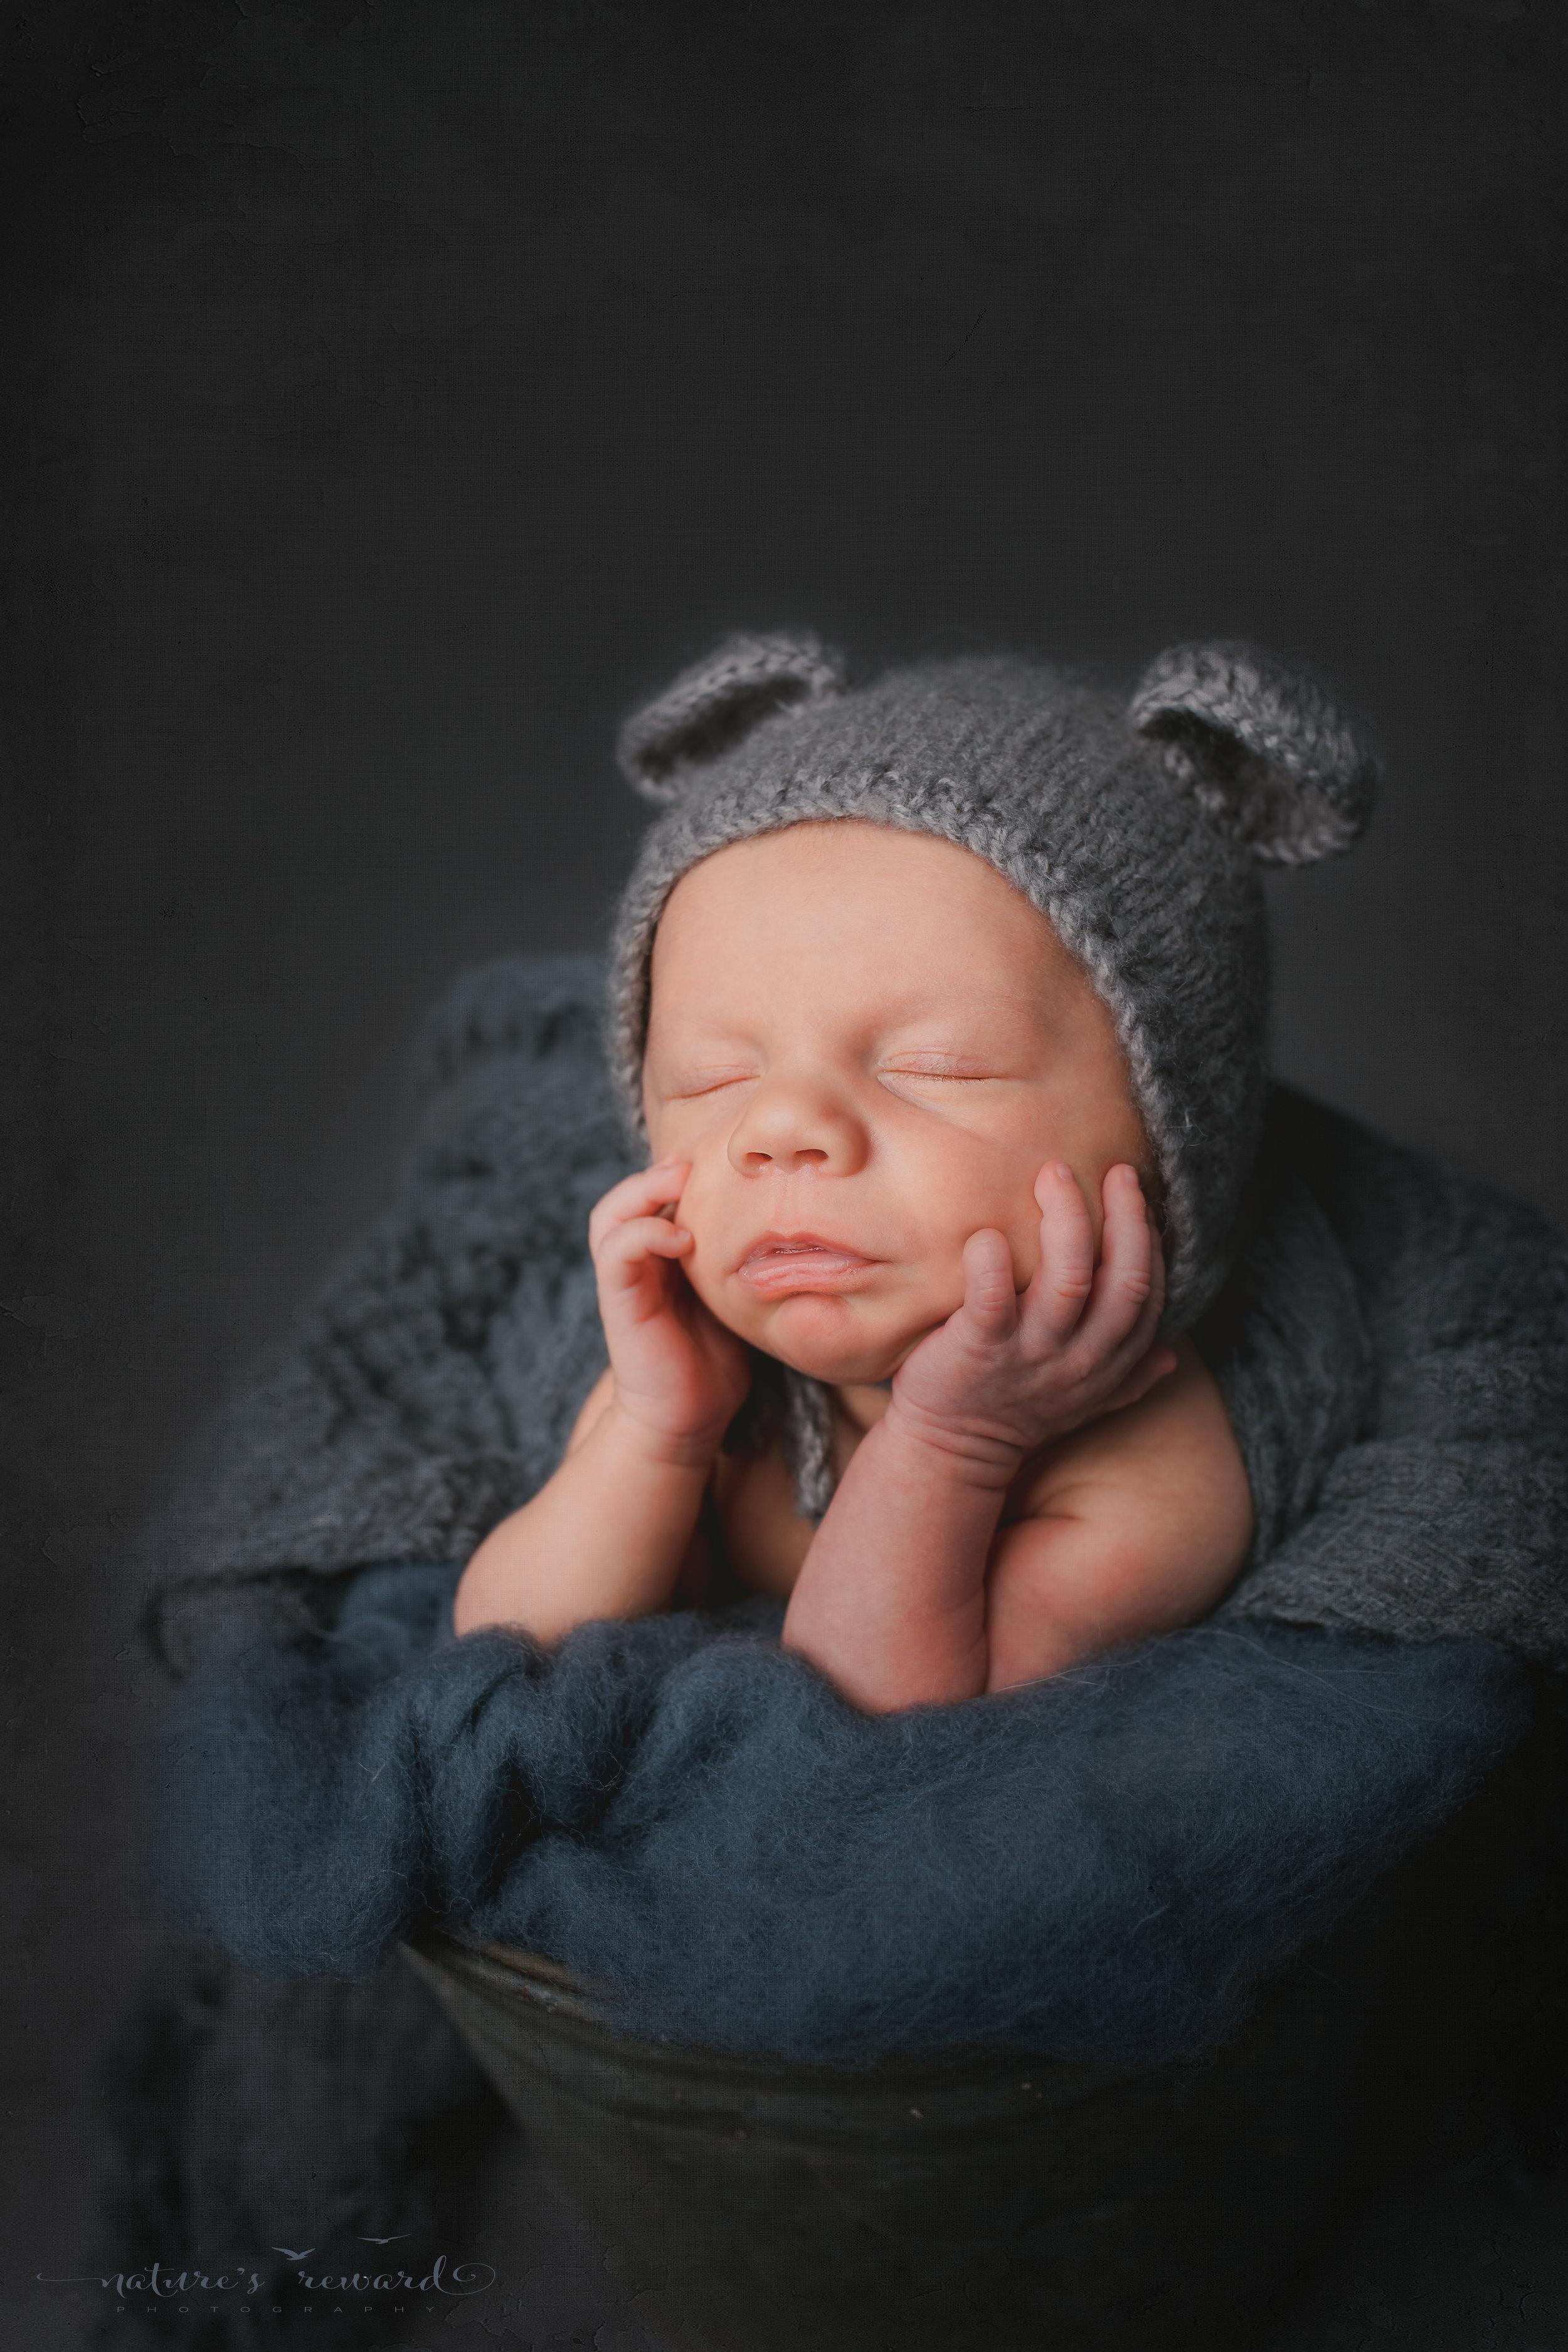 A baby boy in a bucket wearing a bear bonnet - a portrait by Nature's Reward Photography